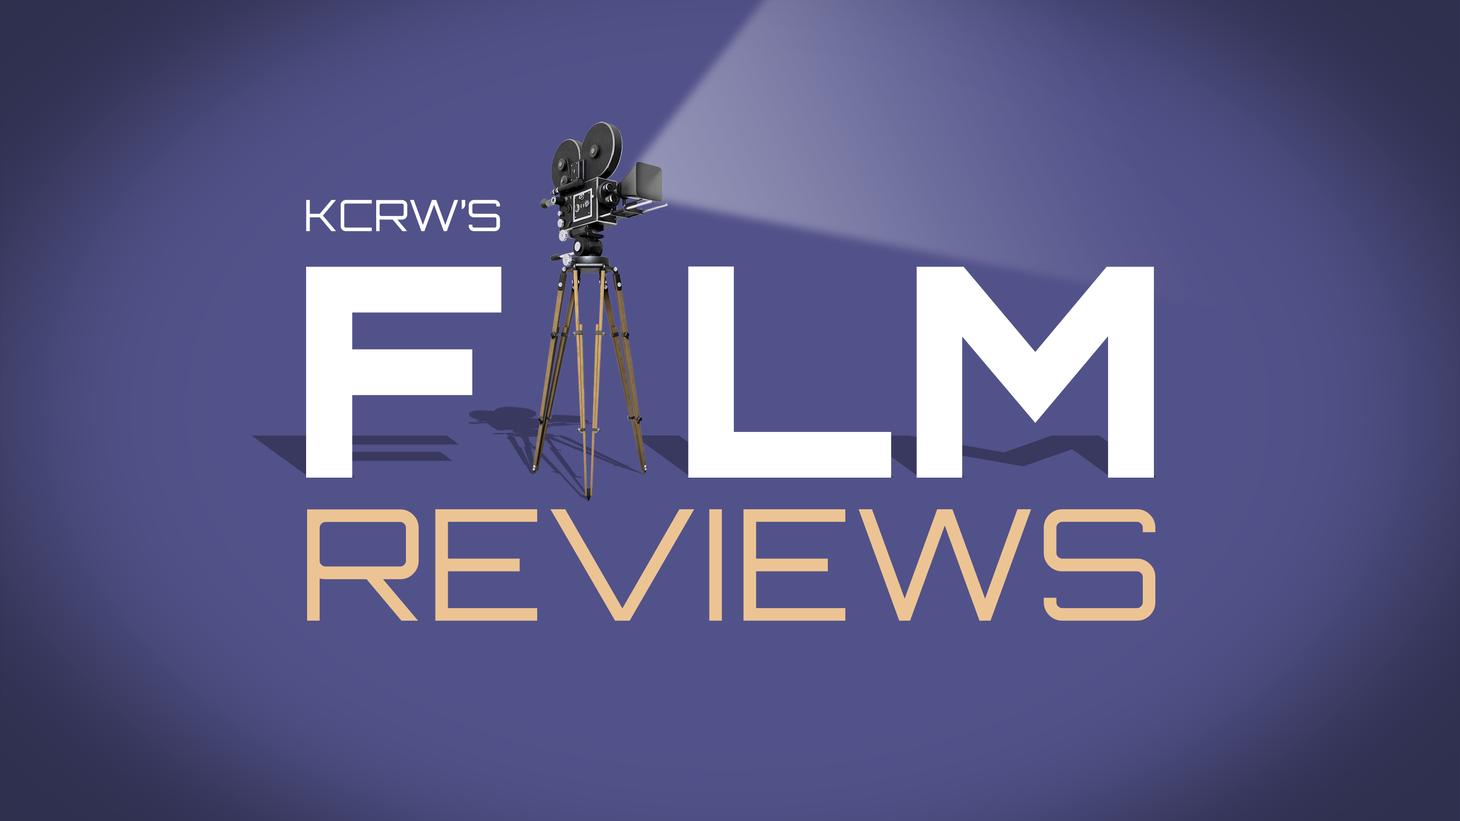 This week, Joe Morgenstern reviews American Dreamz and The Sentinel.